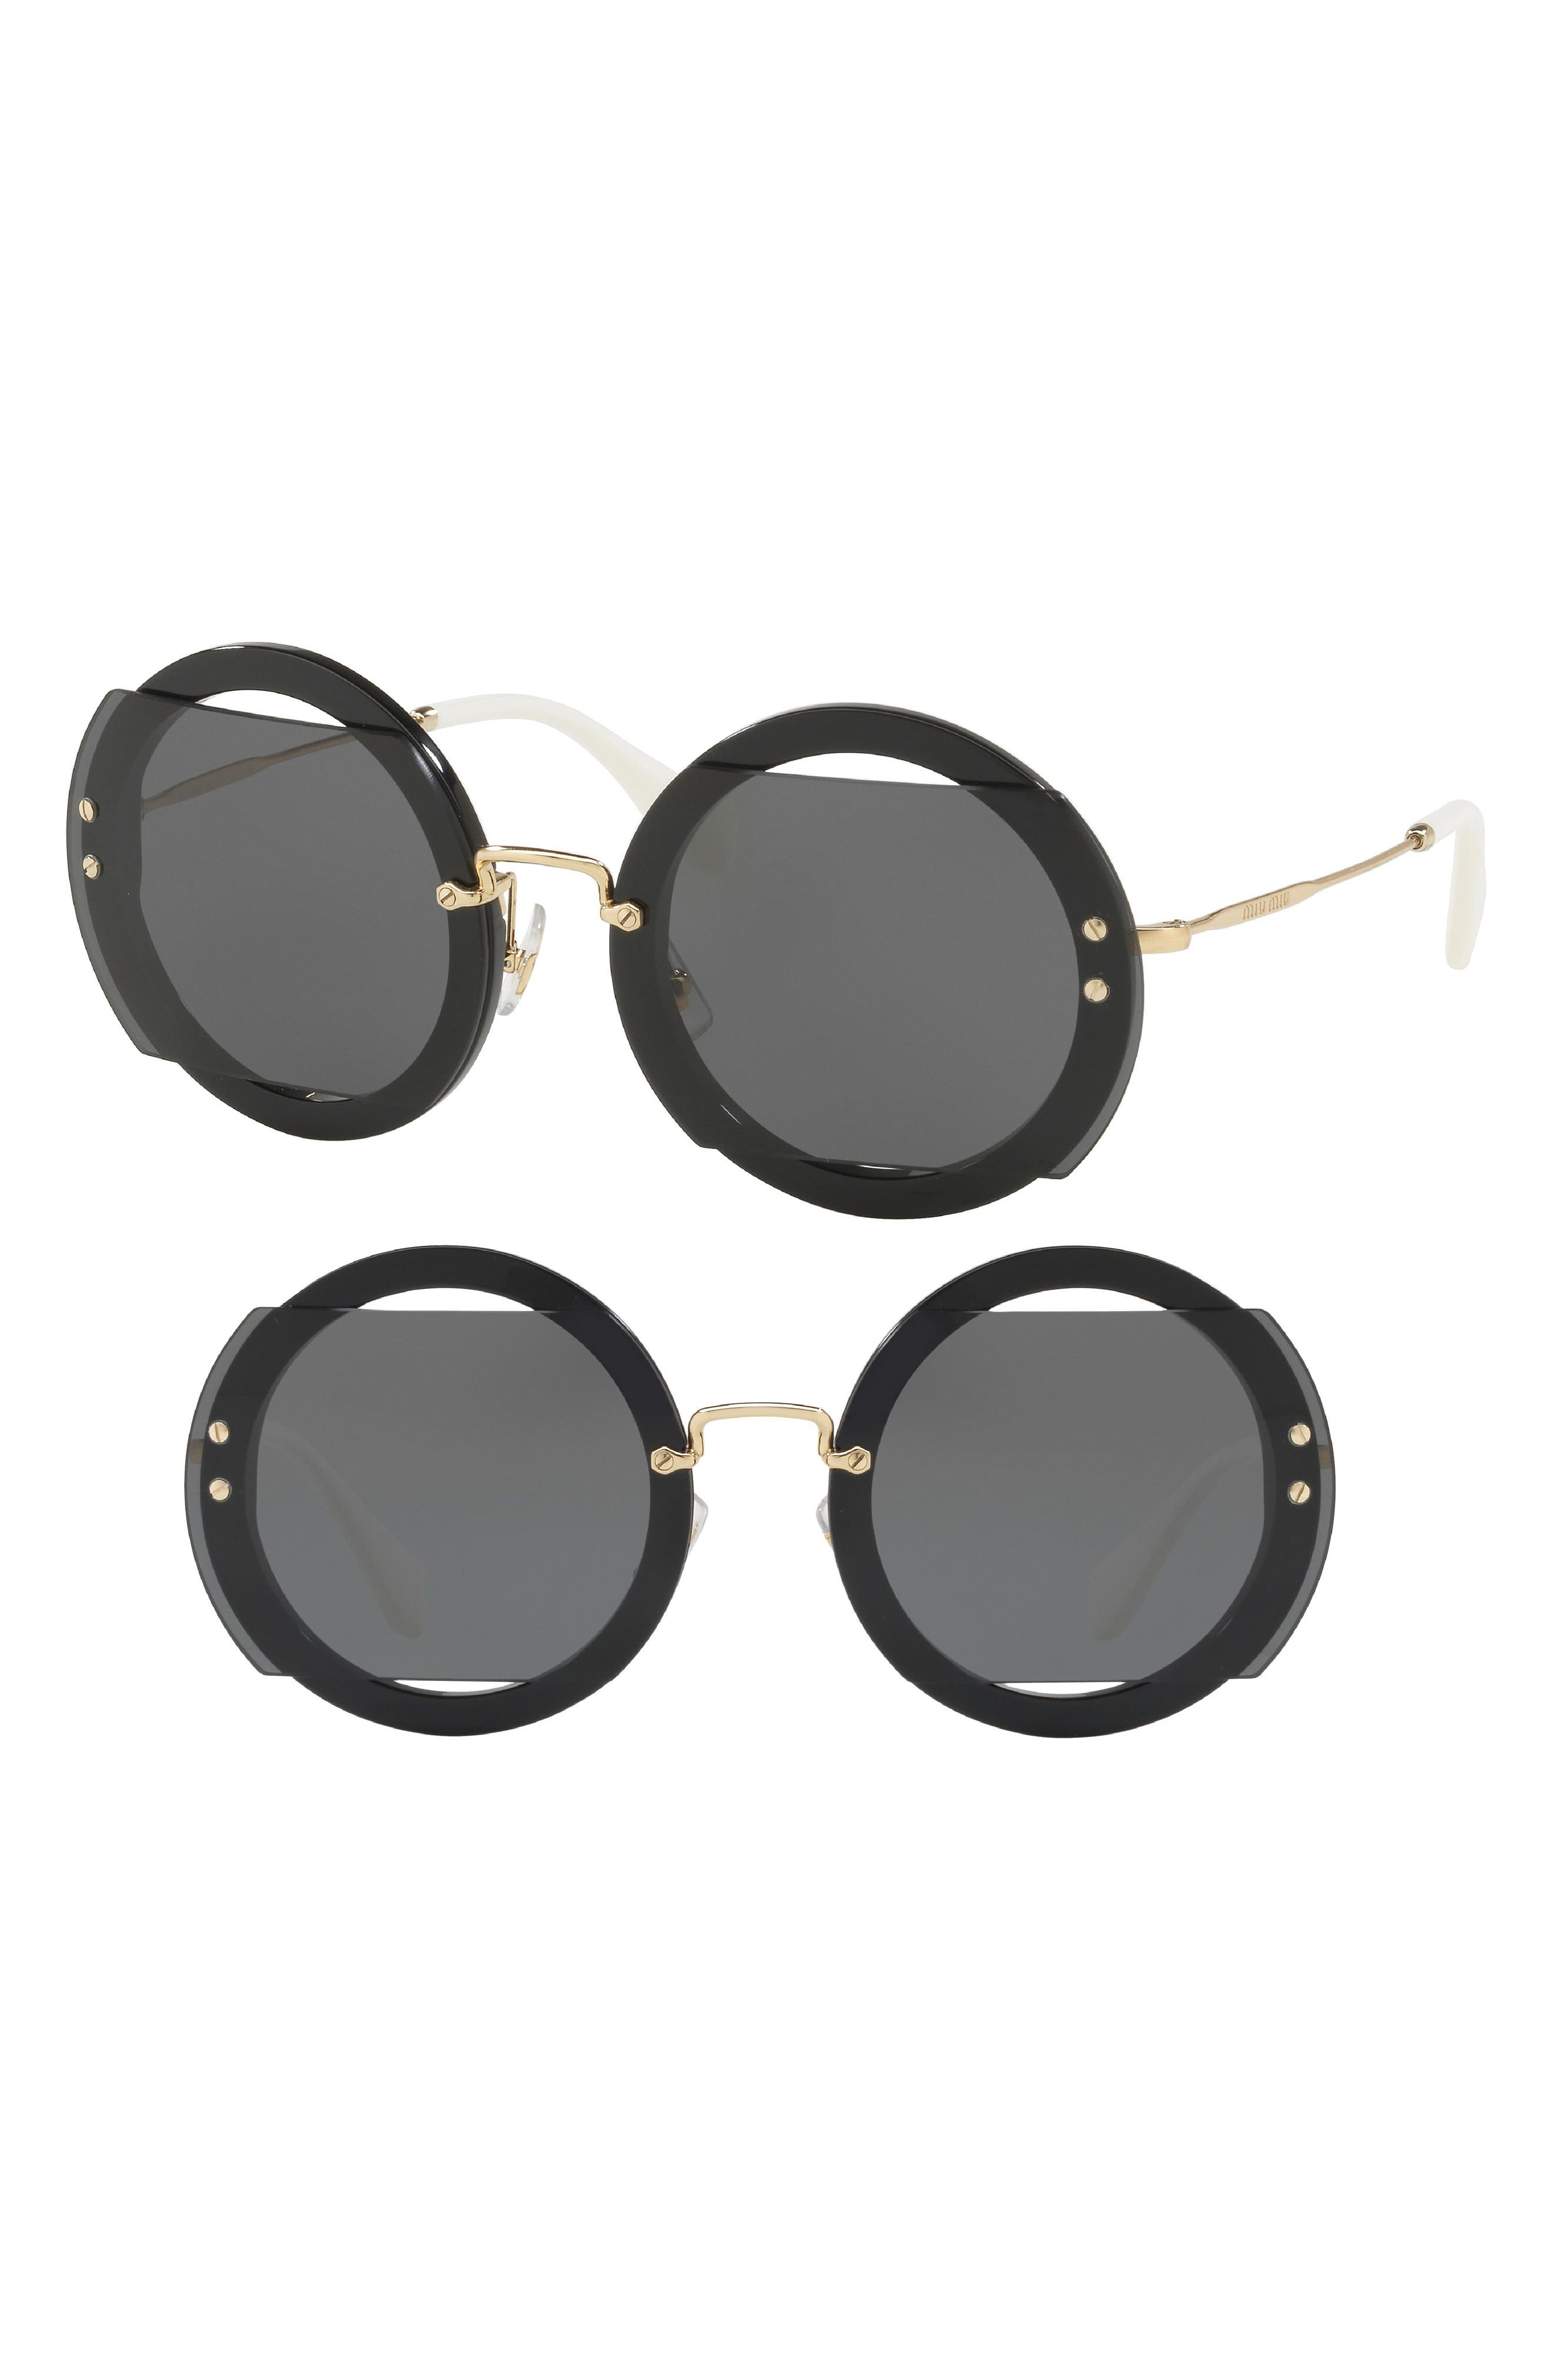 63mm Round Sunglasses,                         Main,                         color, 017